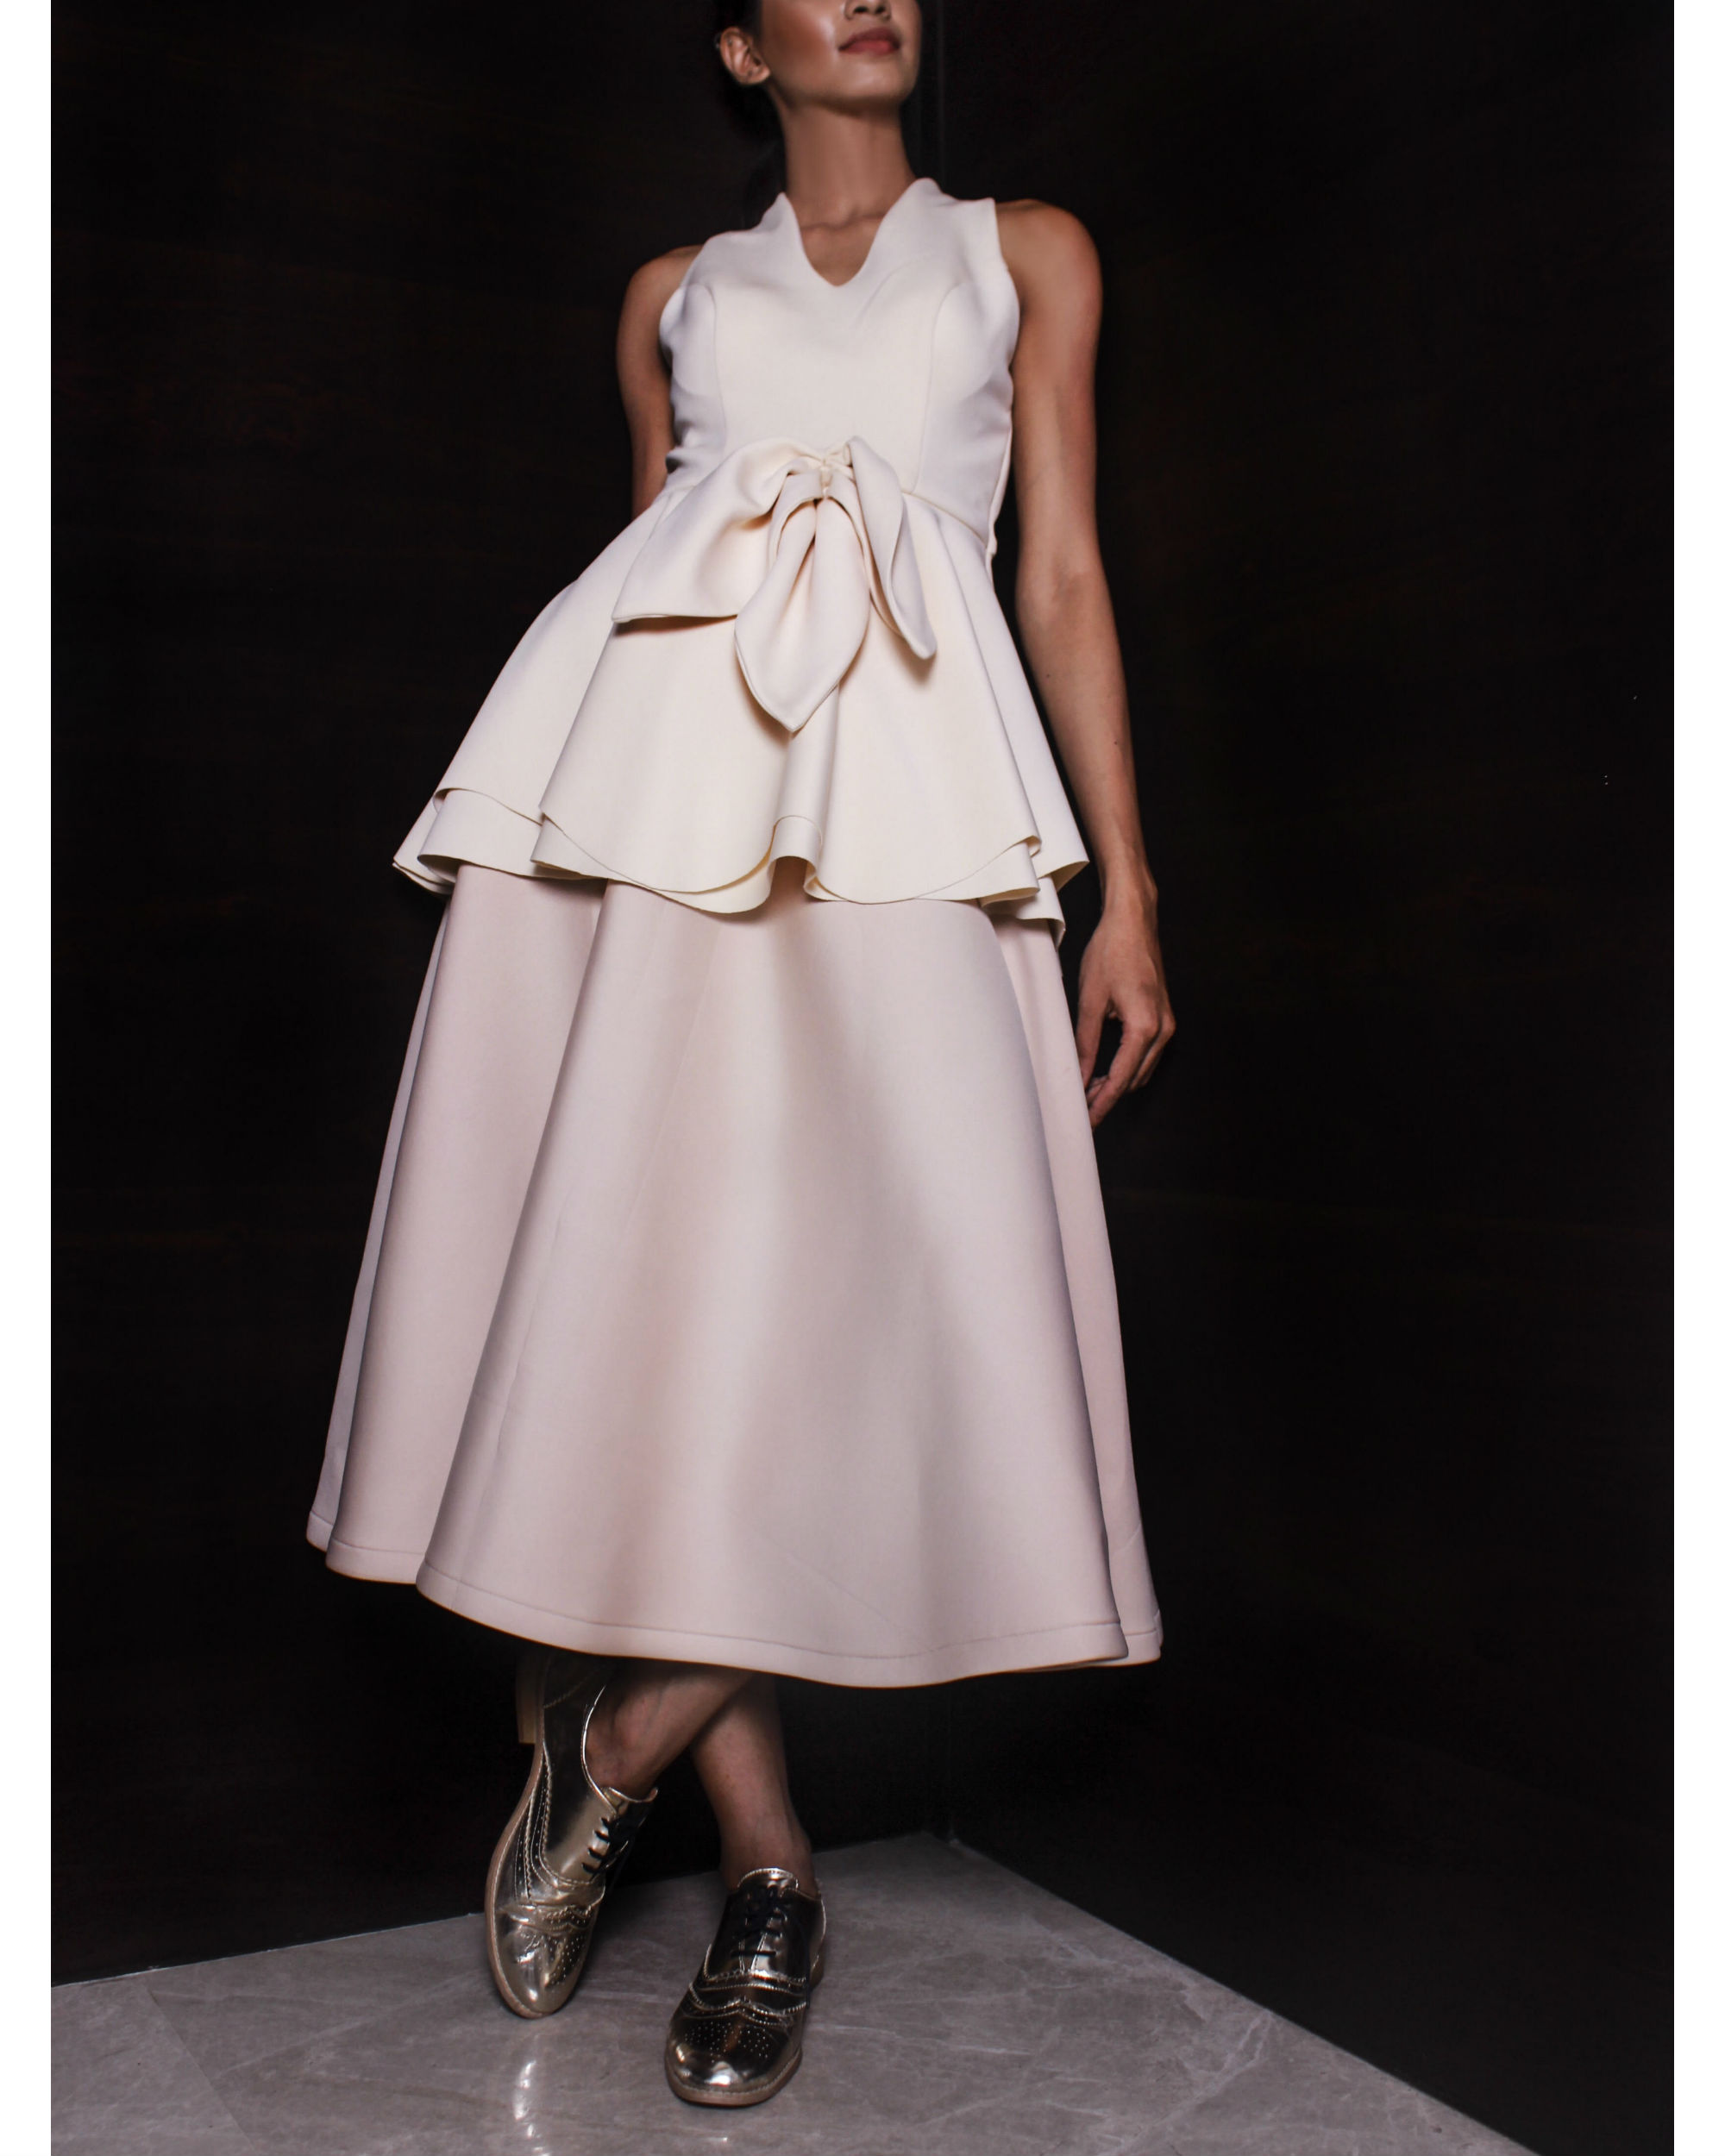 Elizabeth skirt